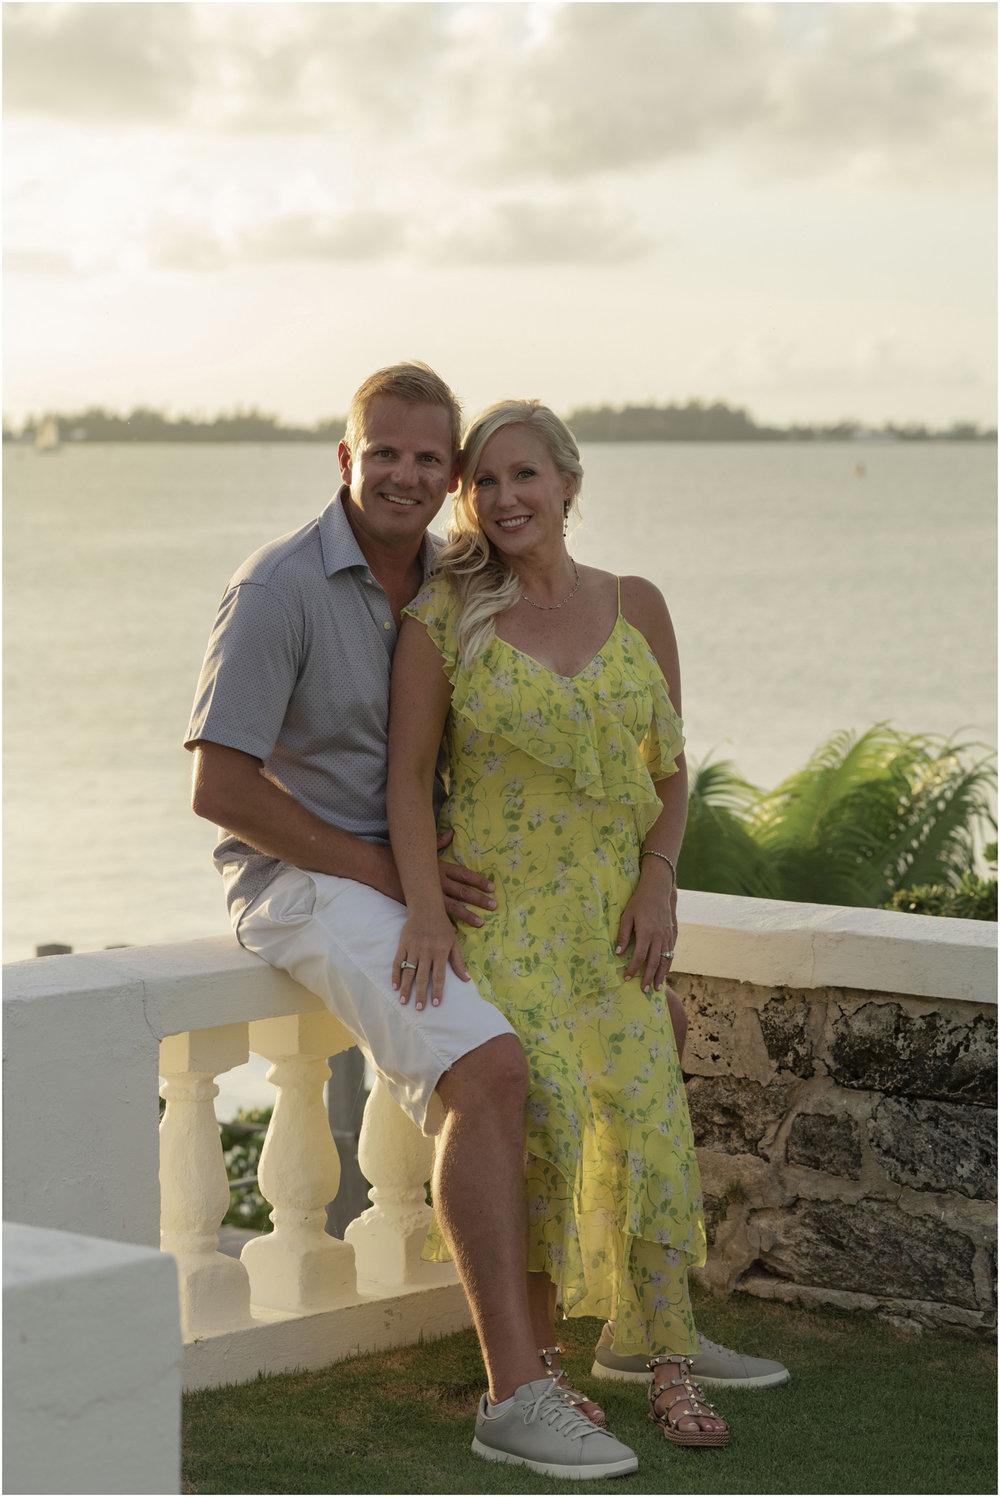 ©FianderFoto_Bermuda_Wedding_Photographer_Long_Island_Bermuda_Nancy_Ray_099.jpg